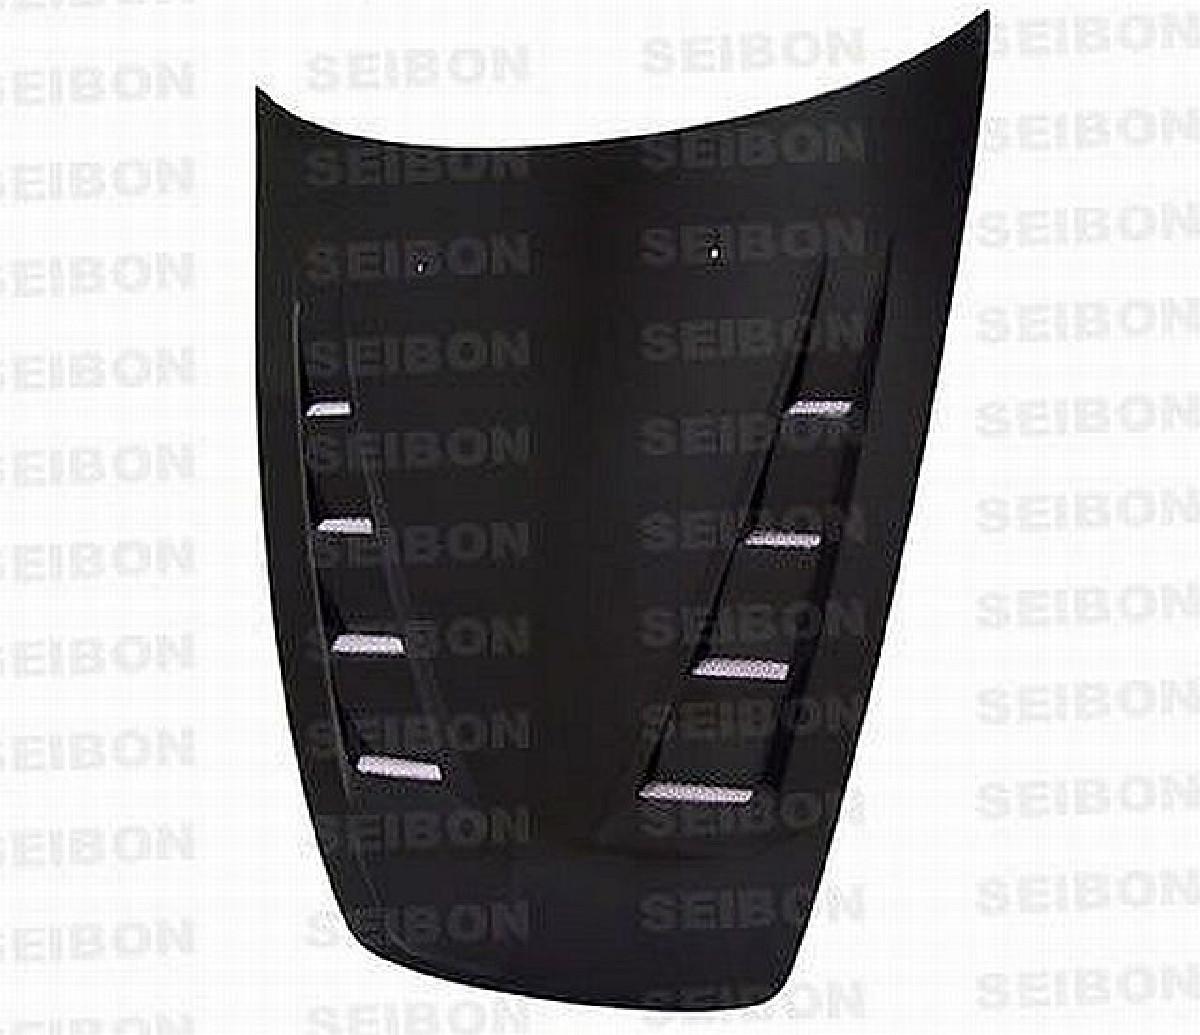 Seibon Mugen Carbon Motorhaube Honda S2000 Bj. 00-06